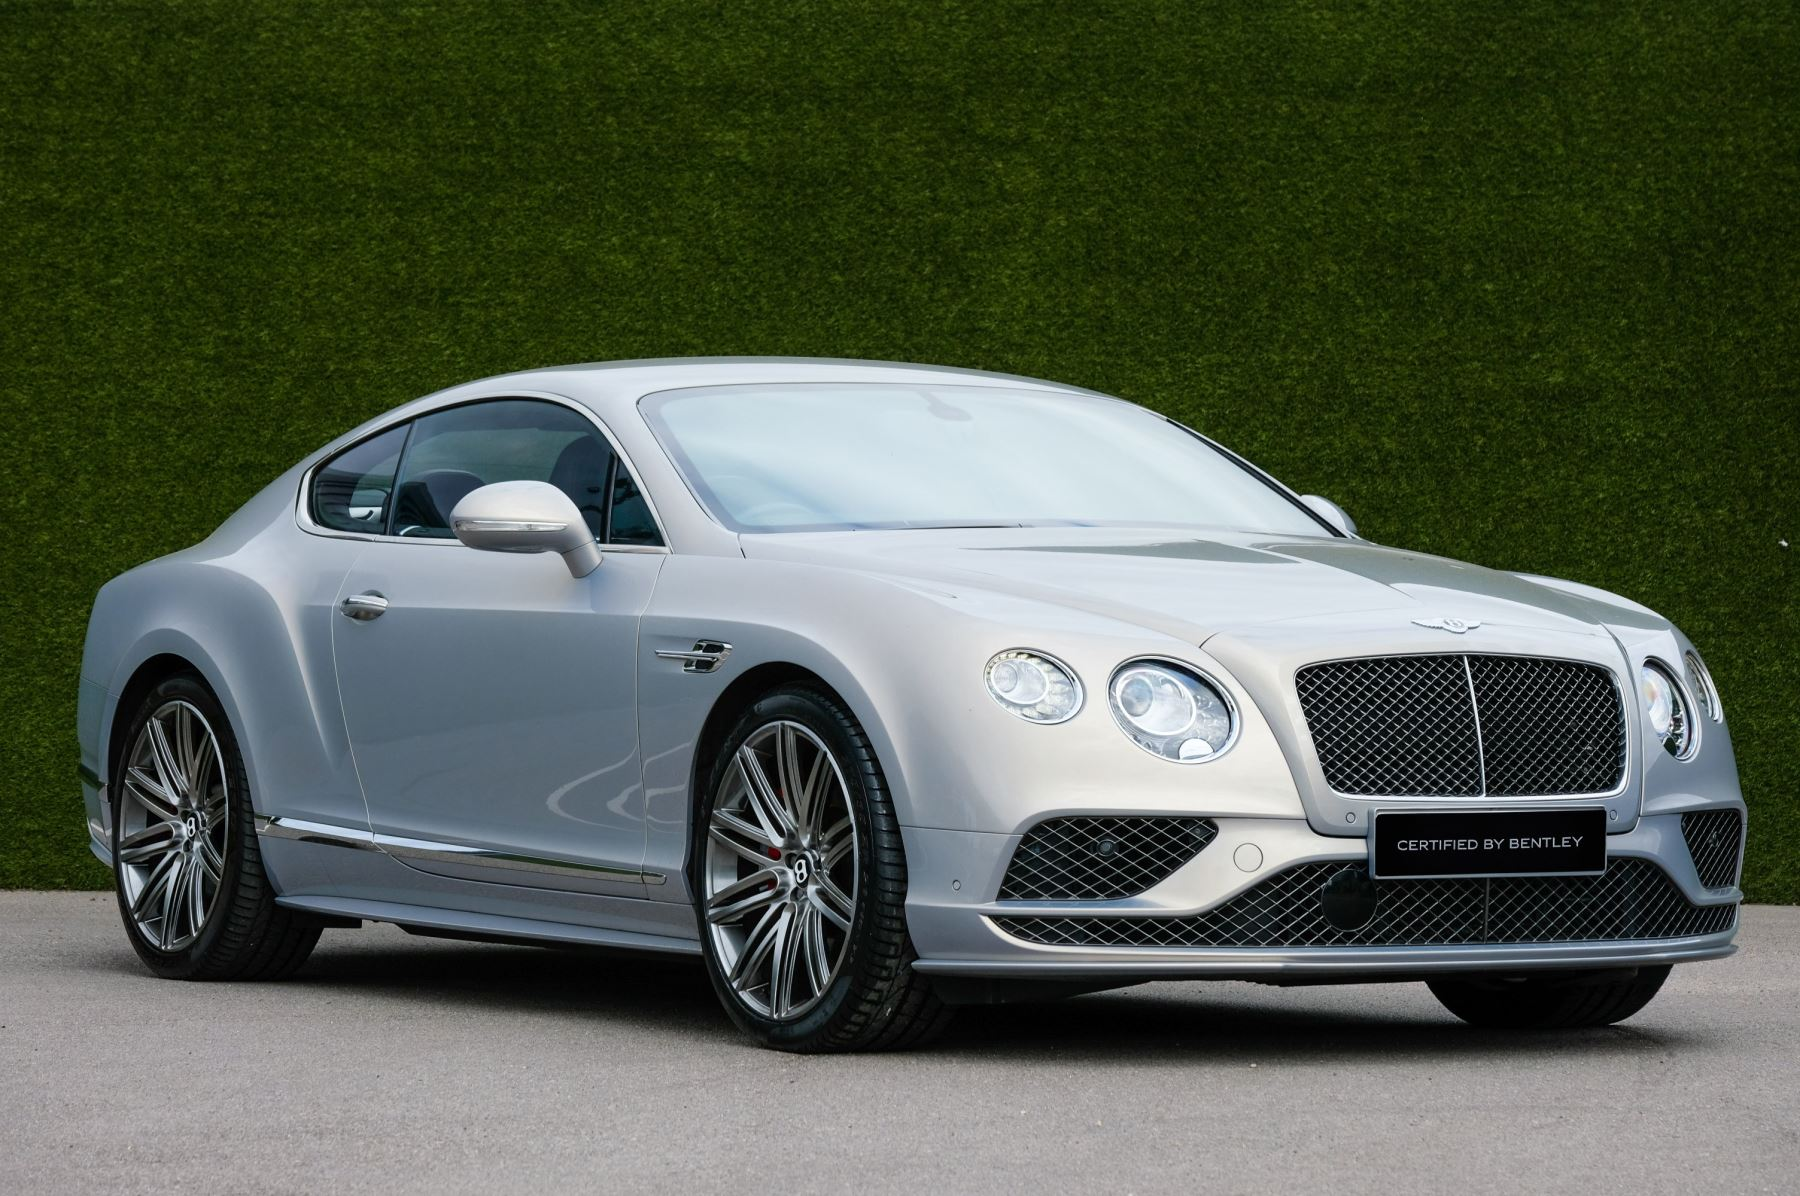 Bentley Continental GT 6.0 W12 [635] Speed - Premier Specification - Carbon Fibre Fascia Panels Automatic 2 door Coupe